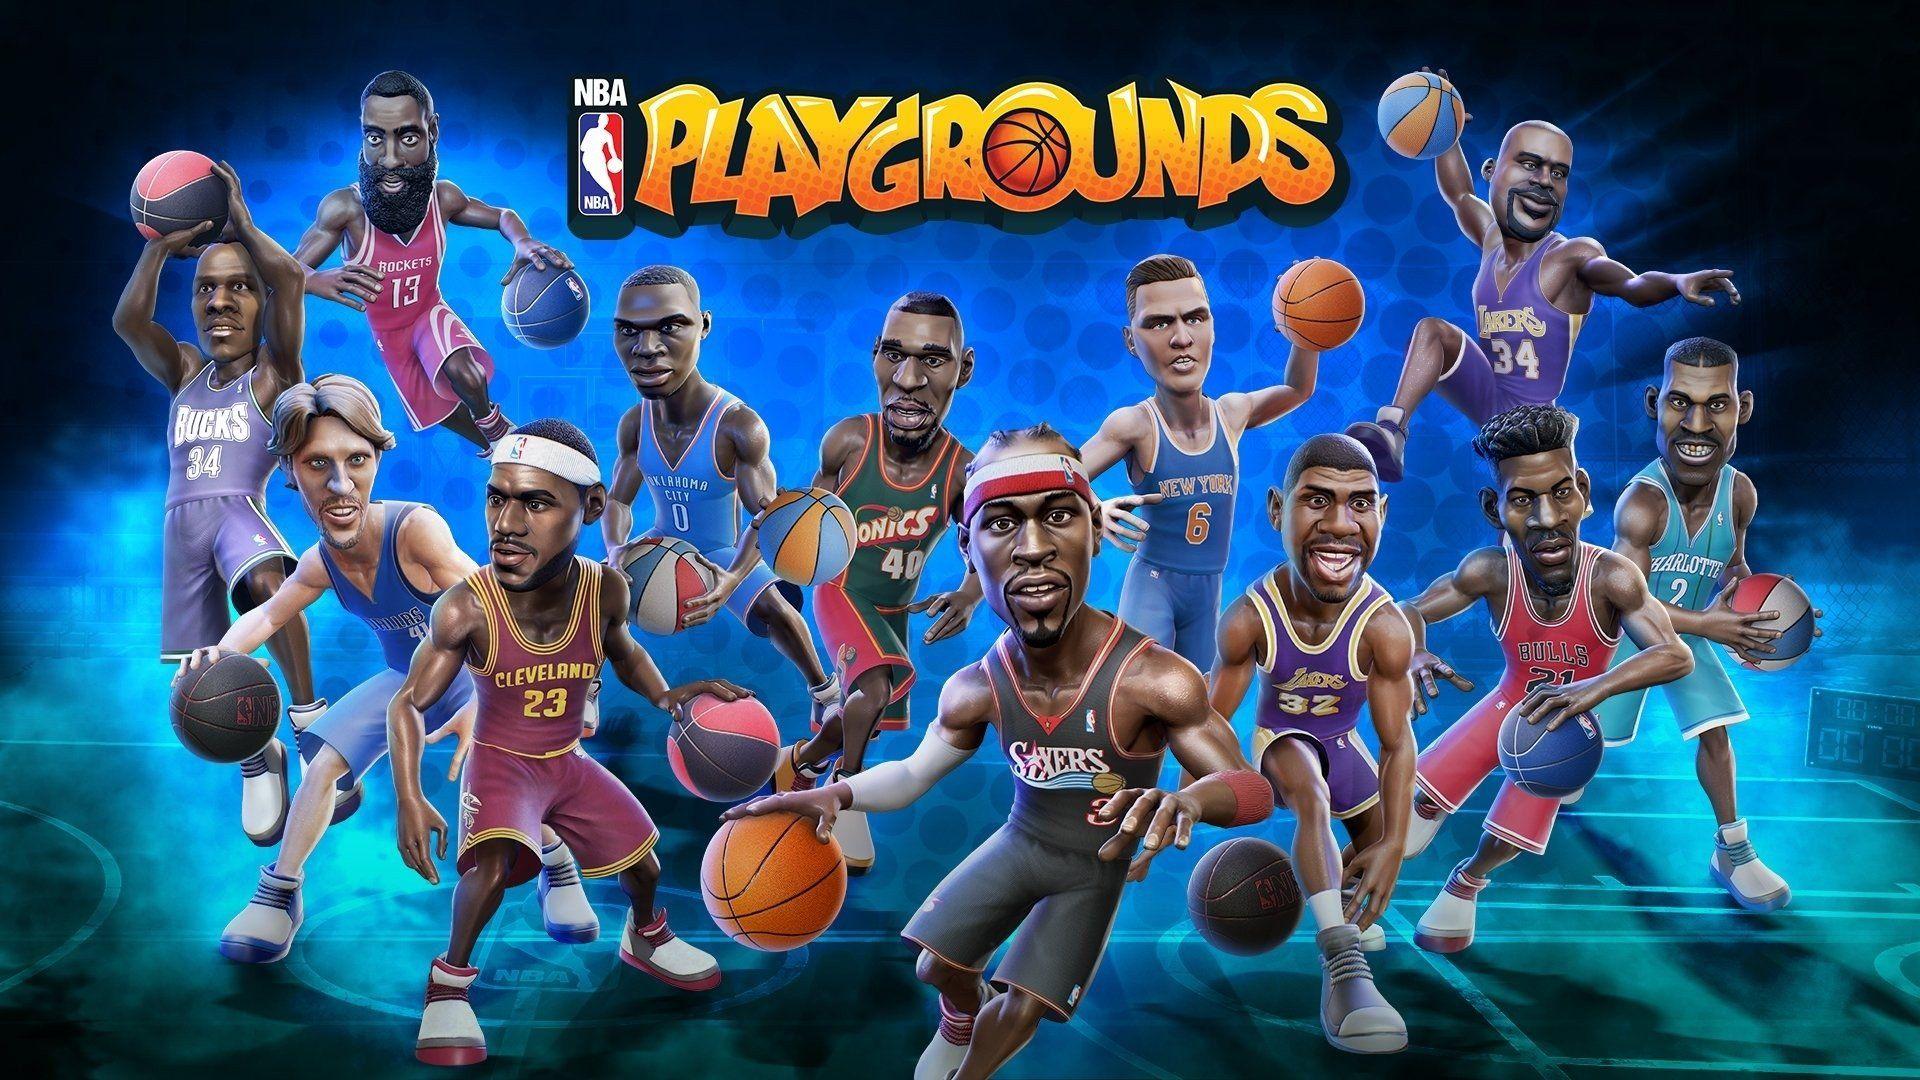 NBA 2k Desktop Wallpapers - Wallpaper Cave